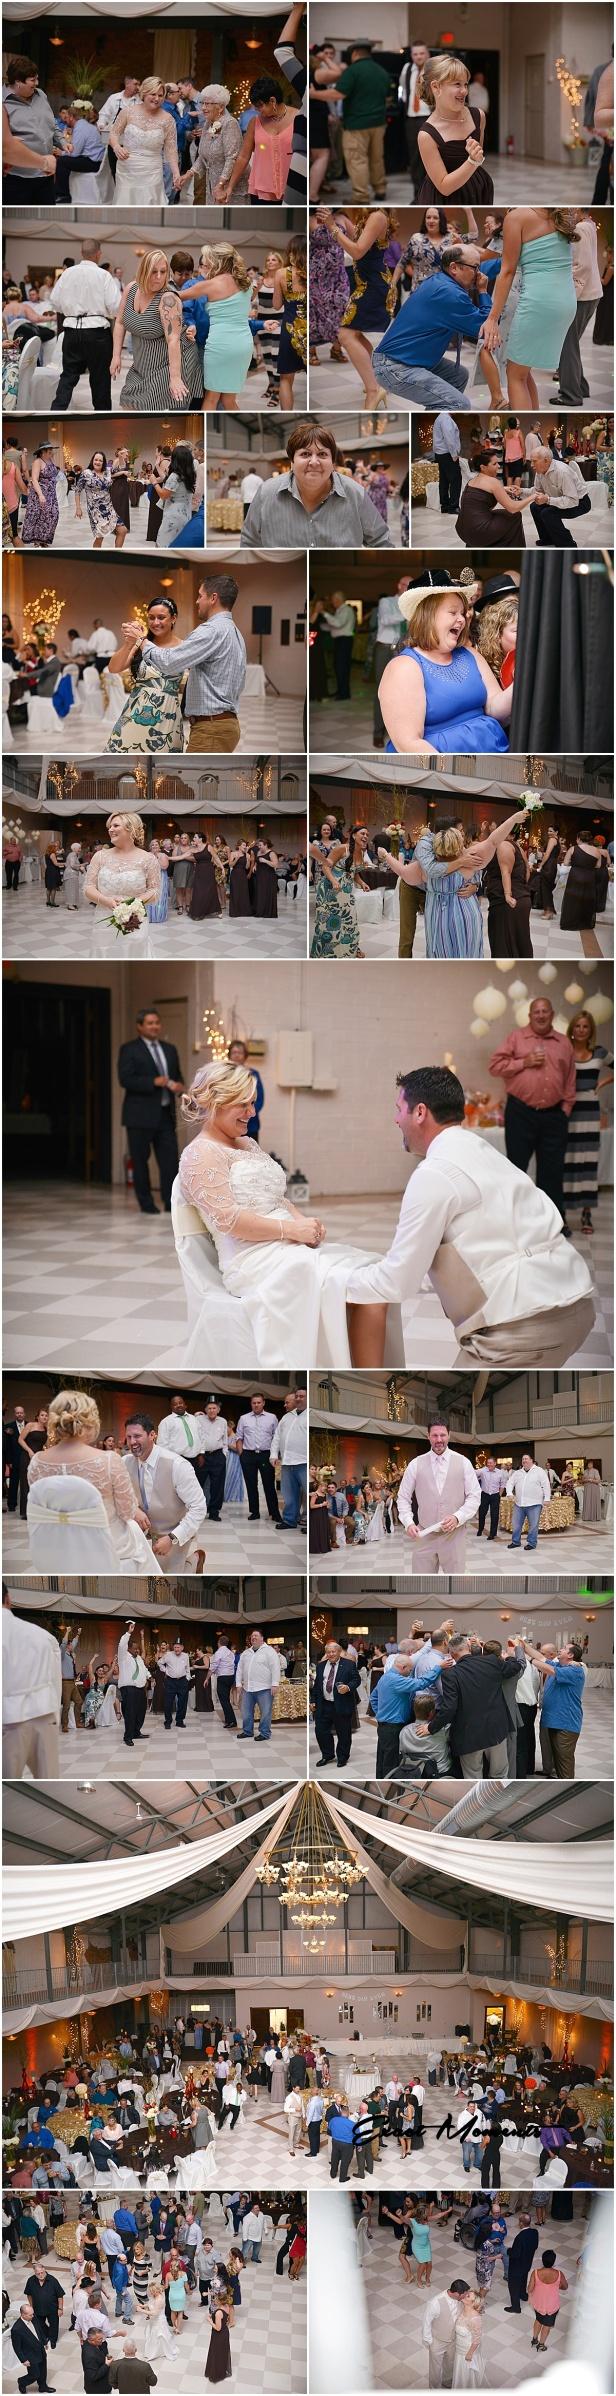 Kenton Armory Wedding Reception